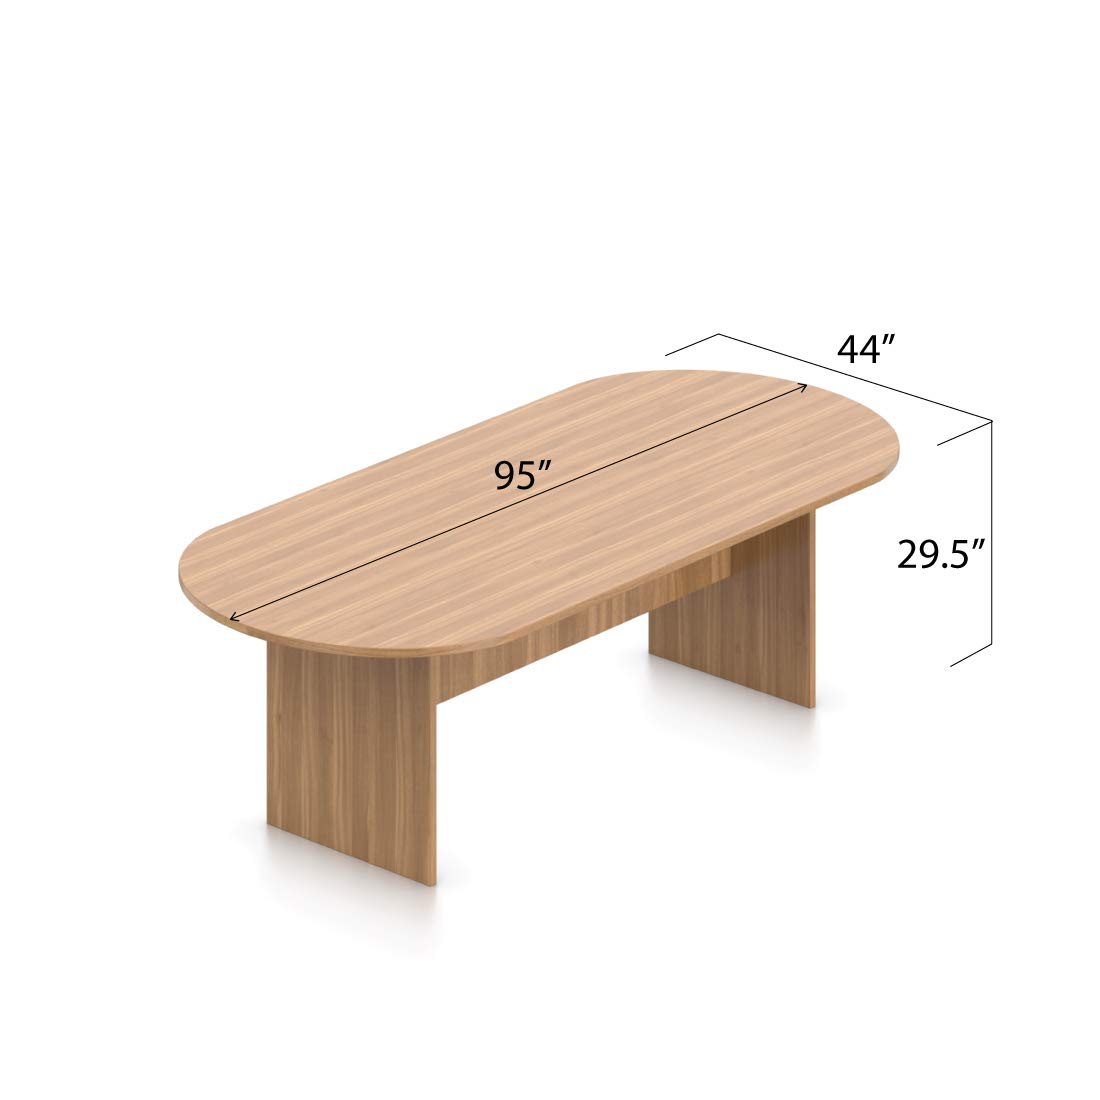 GOF 8 FT Conference Table (95W x 44D x 29.5H), Cherry, Espresso, Mahogany, Walnut (Walnut)